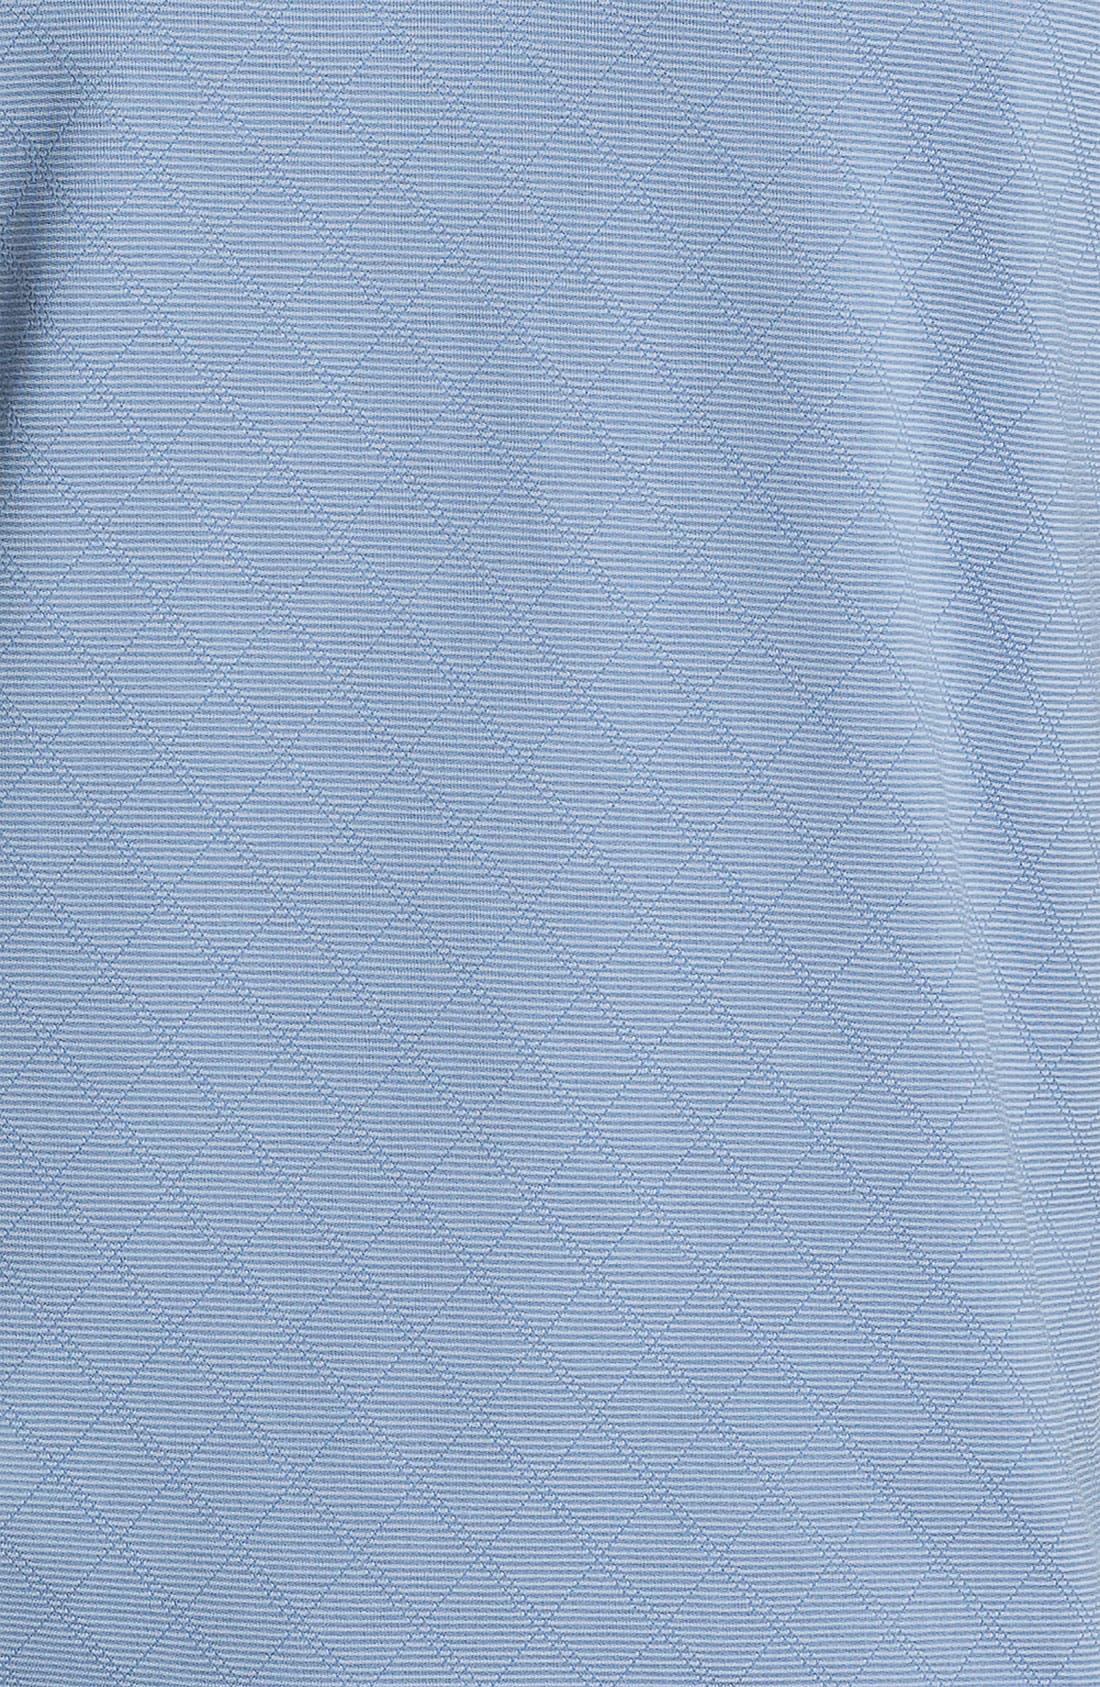 Alternate Image 3  - Cutter & Buck 'Luxe - Embry' DryTec Golf Polo (Big & Tall)